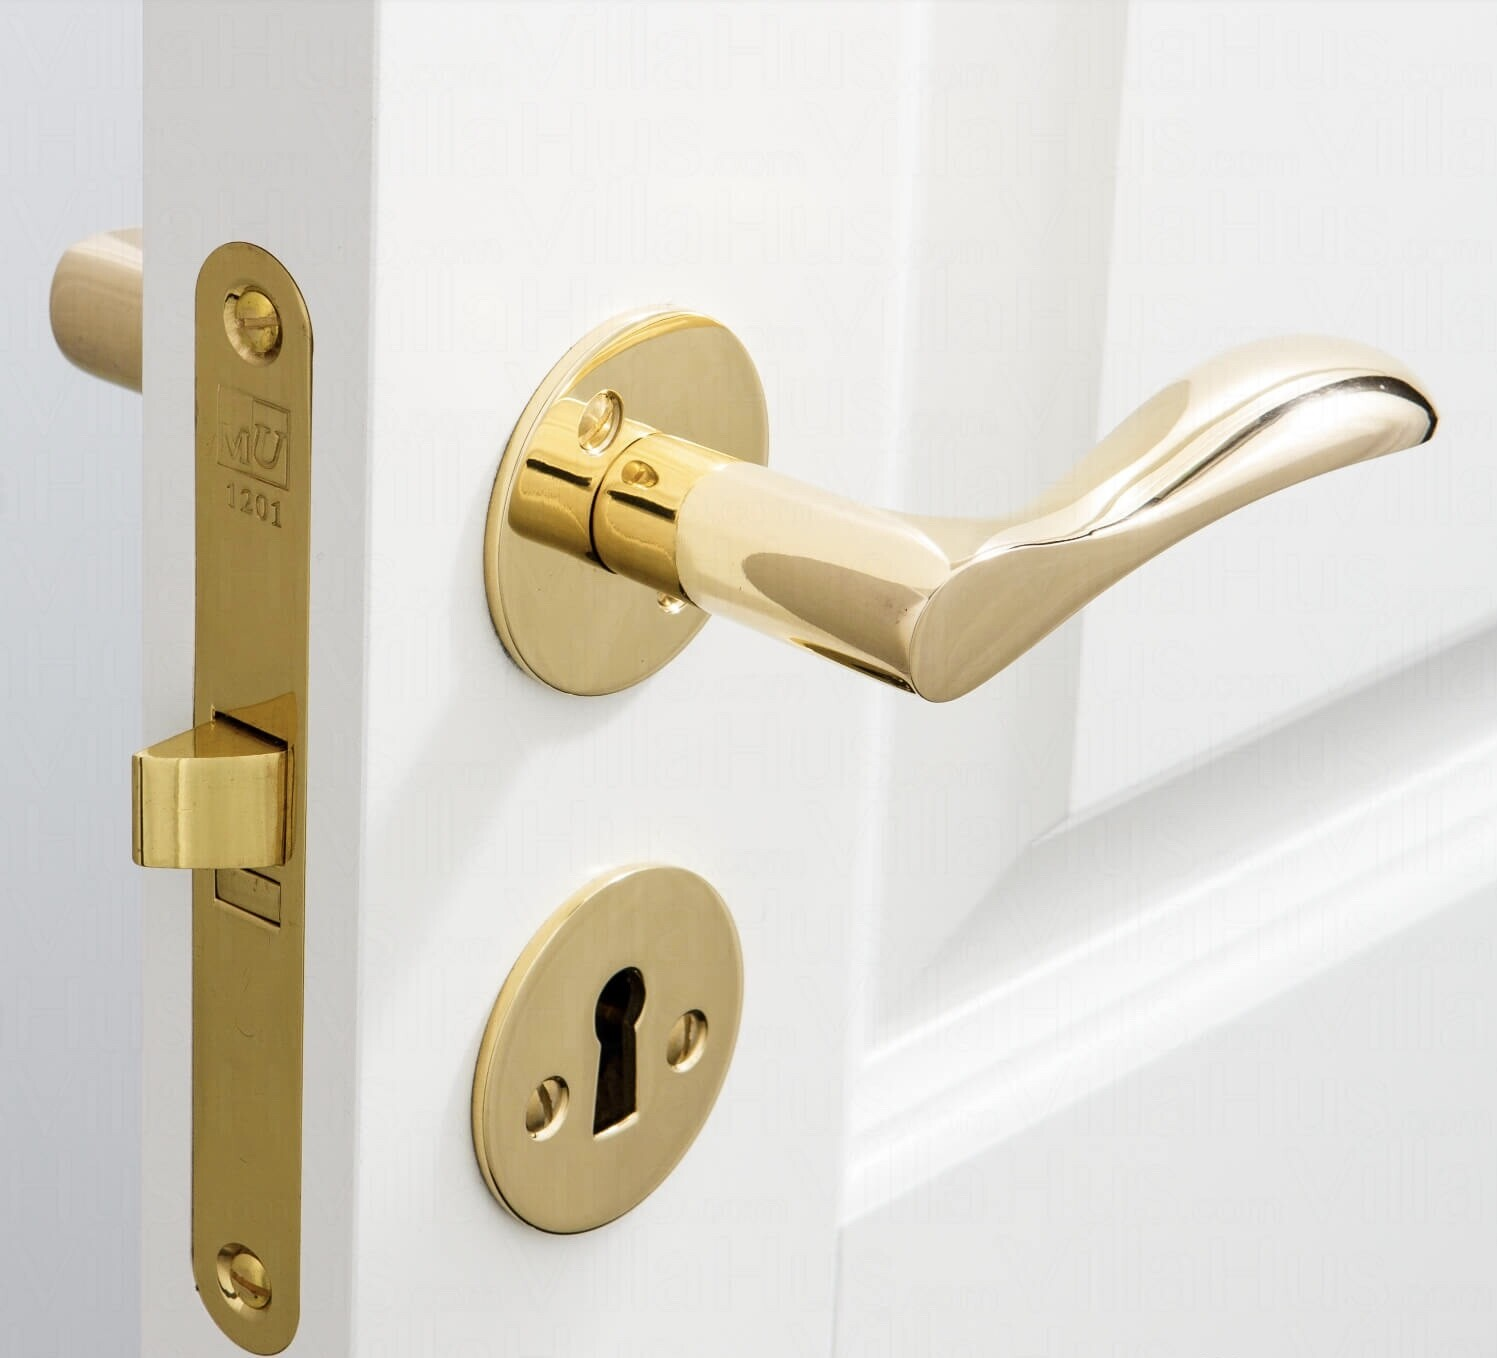 INTERNAL & EXTERNAL DOOR HANDLES (Prices vary)